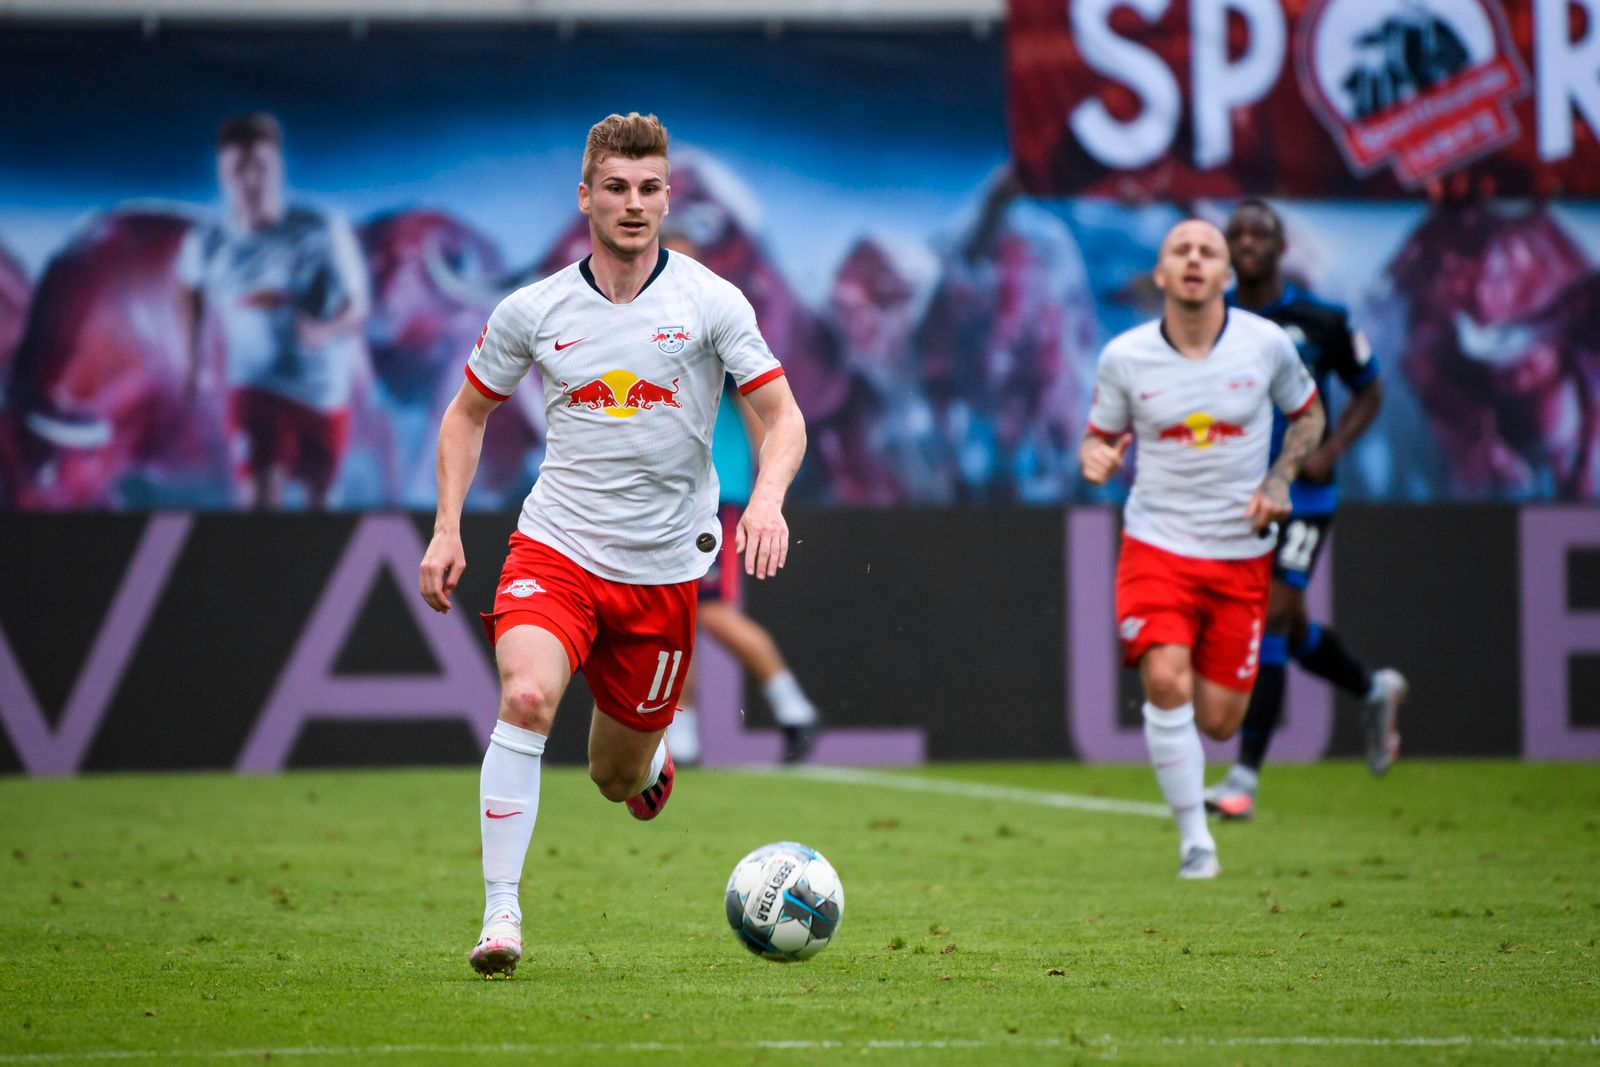 Fussball 1.Bundesliga, RB Leipzig - SC Paderborn 06.06.2020, xkvx, Fussball 1.Bundesliga, RB Leipzig - SC Paderborn emsp